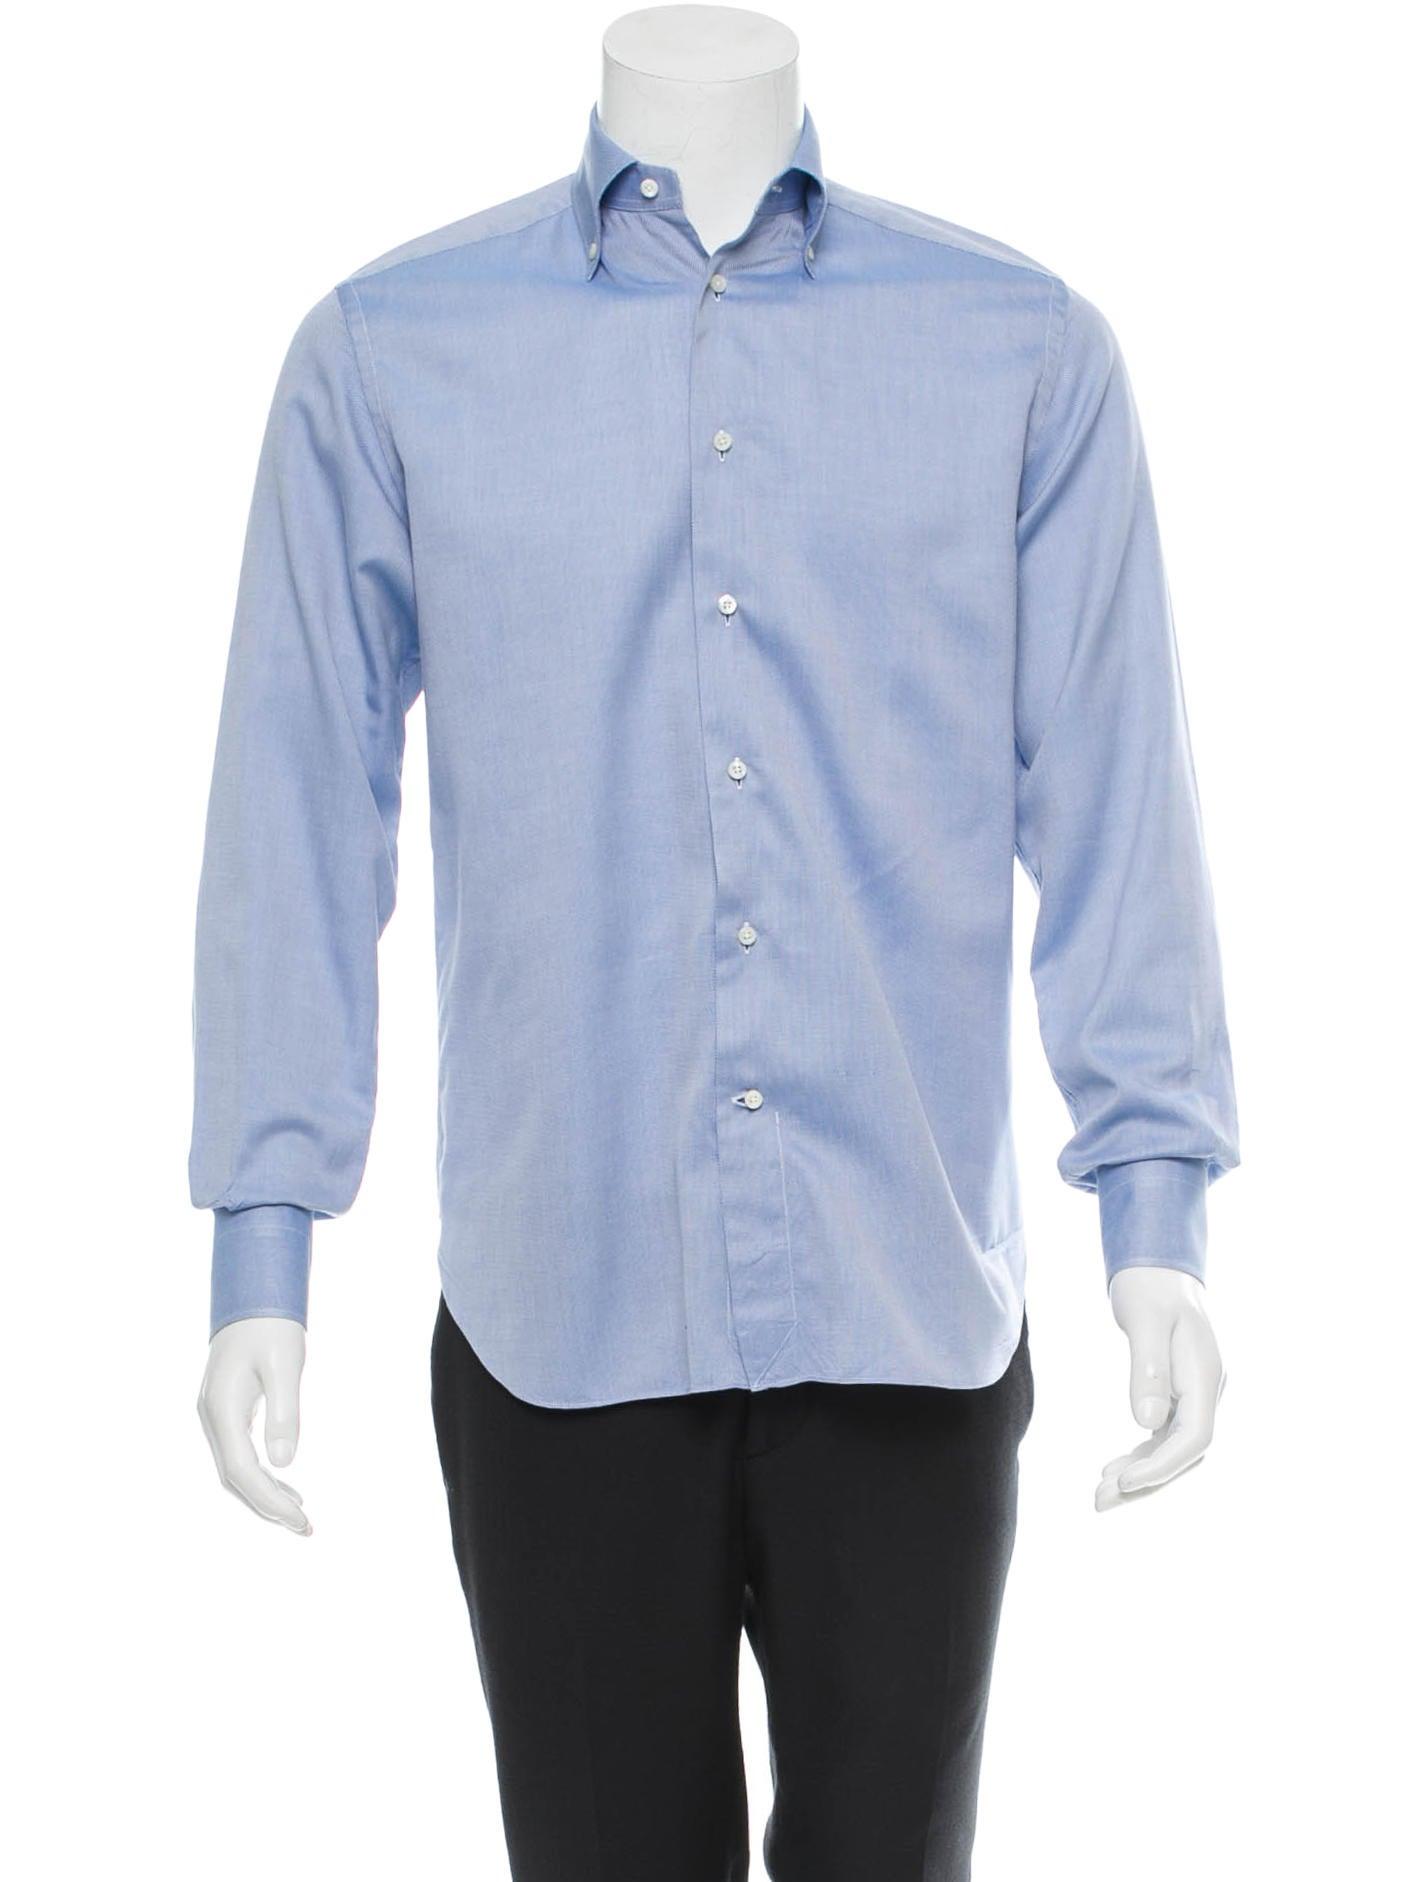 ermenegildo zegna shirt clothing zgn21531 the realreal. Black Bedroom Furniture Sets. Home Design Ideas